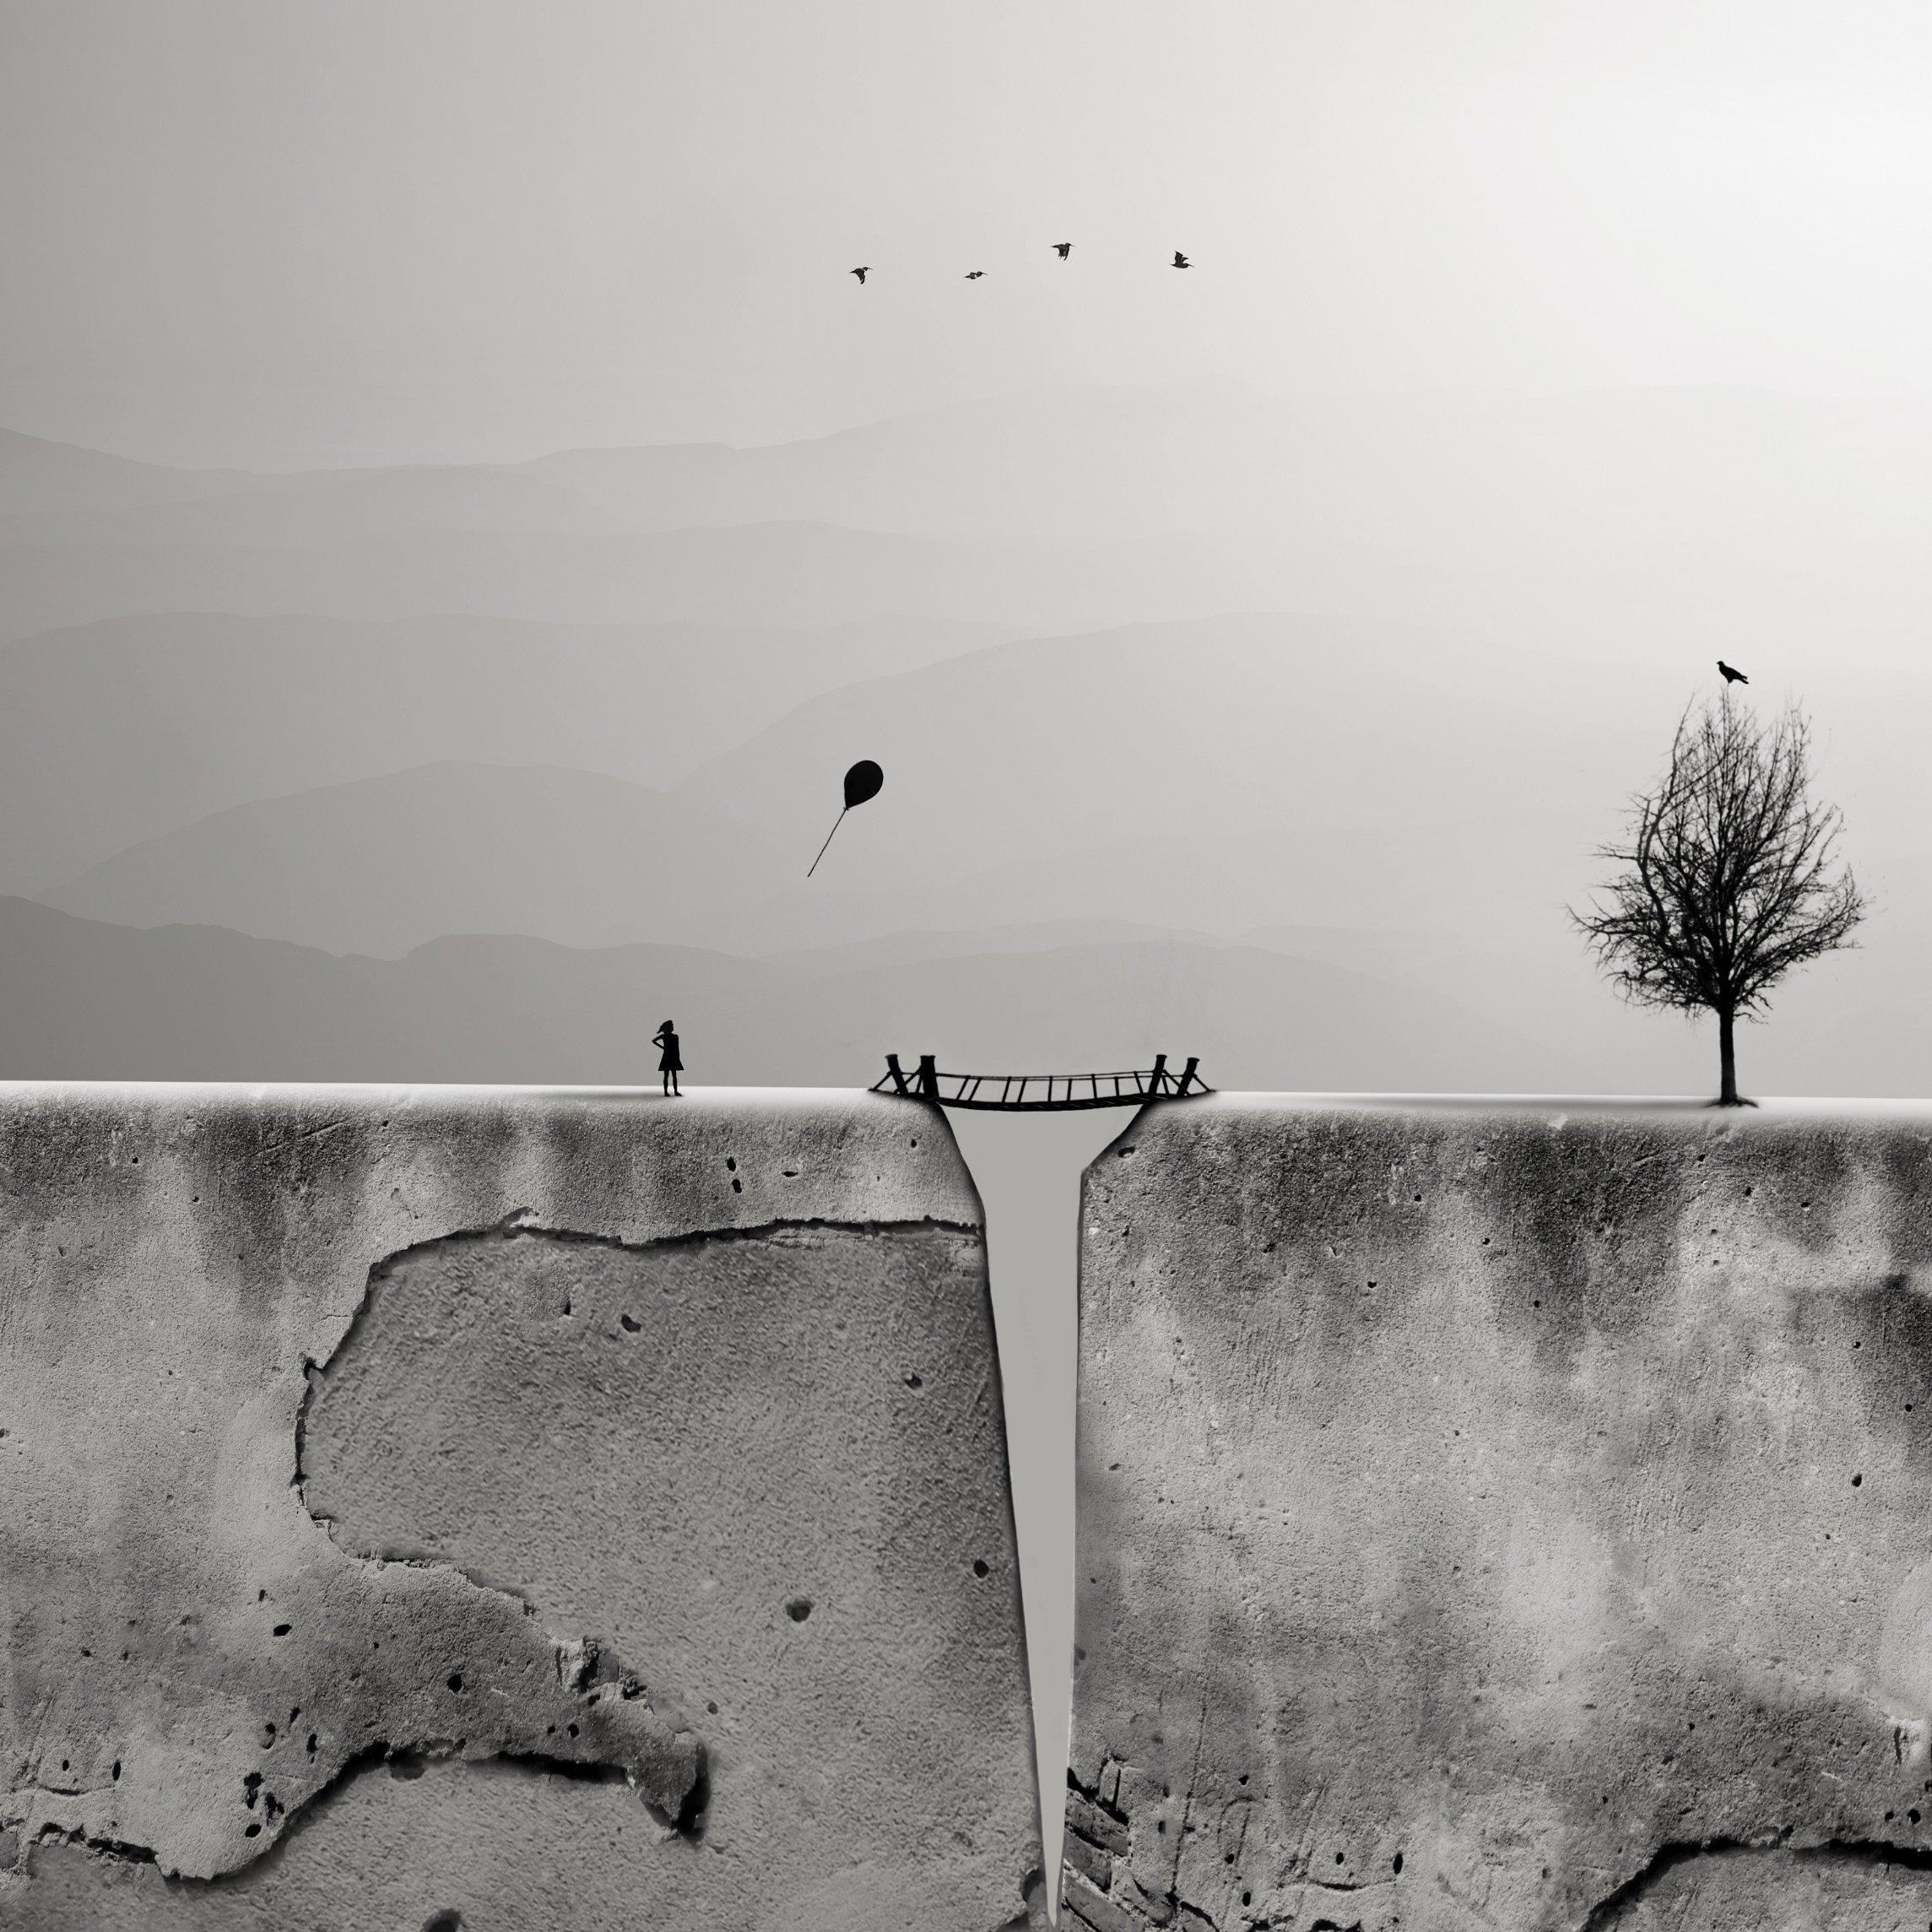 #35photo #surrealart#ps_fantasy#art_minimal #bnw_dream #photography#minimalism#conceptual#fineart #instagram#iranfeature#bnwminimalismmag#art_digital #ir_photographer#iran #photographize#blackandwhite#bnw_greatshots  #surreal#hadimalijani#art#fantastic_ea, Hadi Malijani